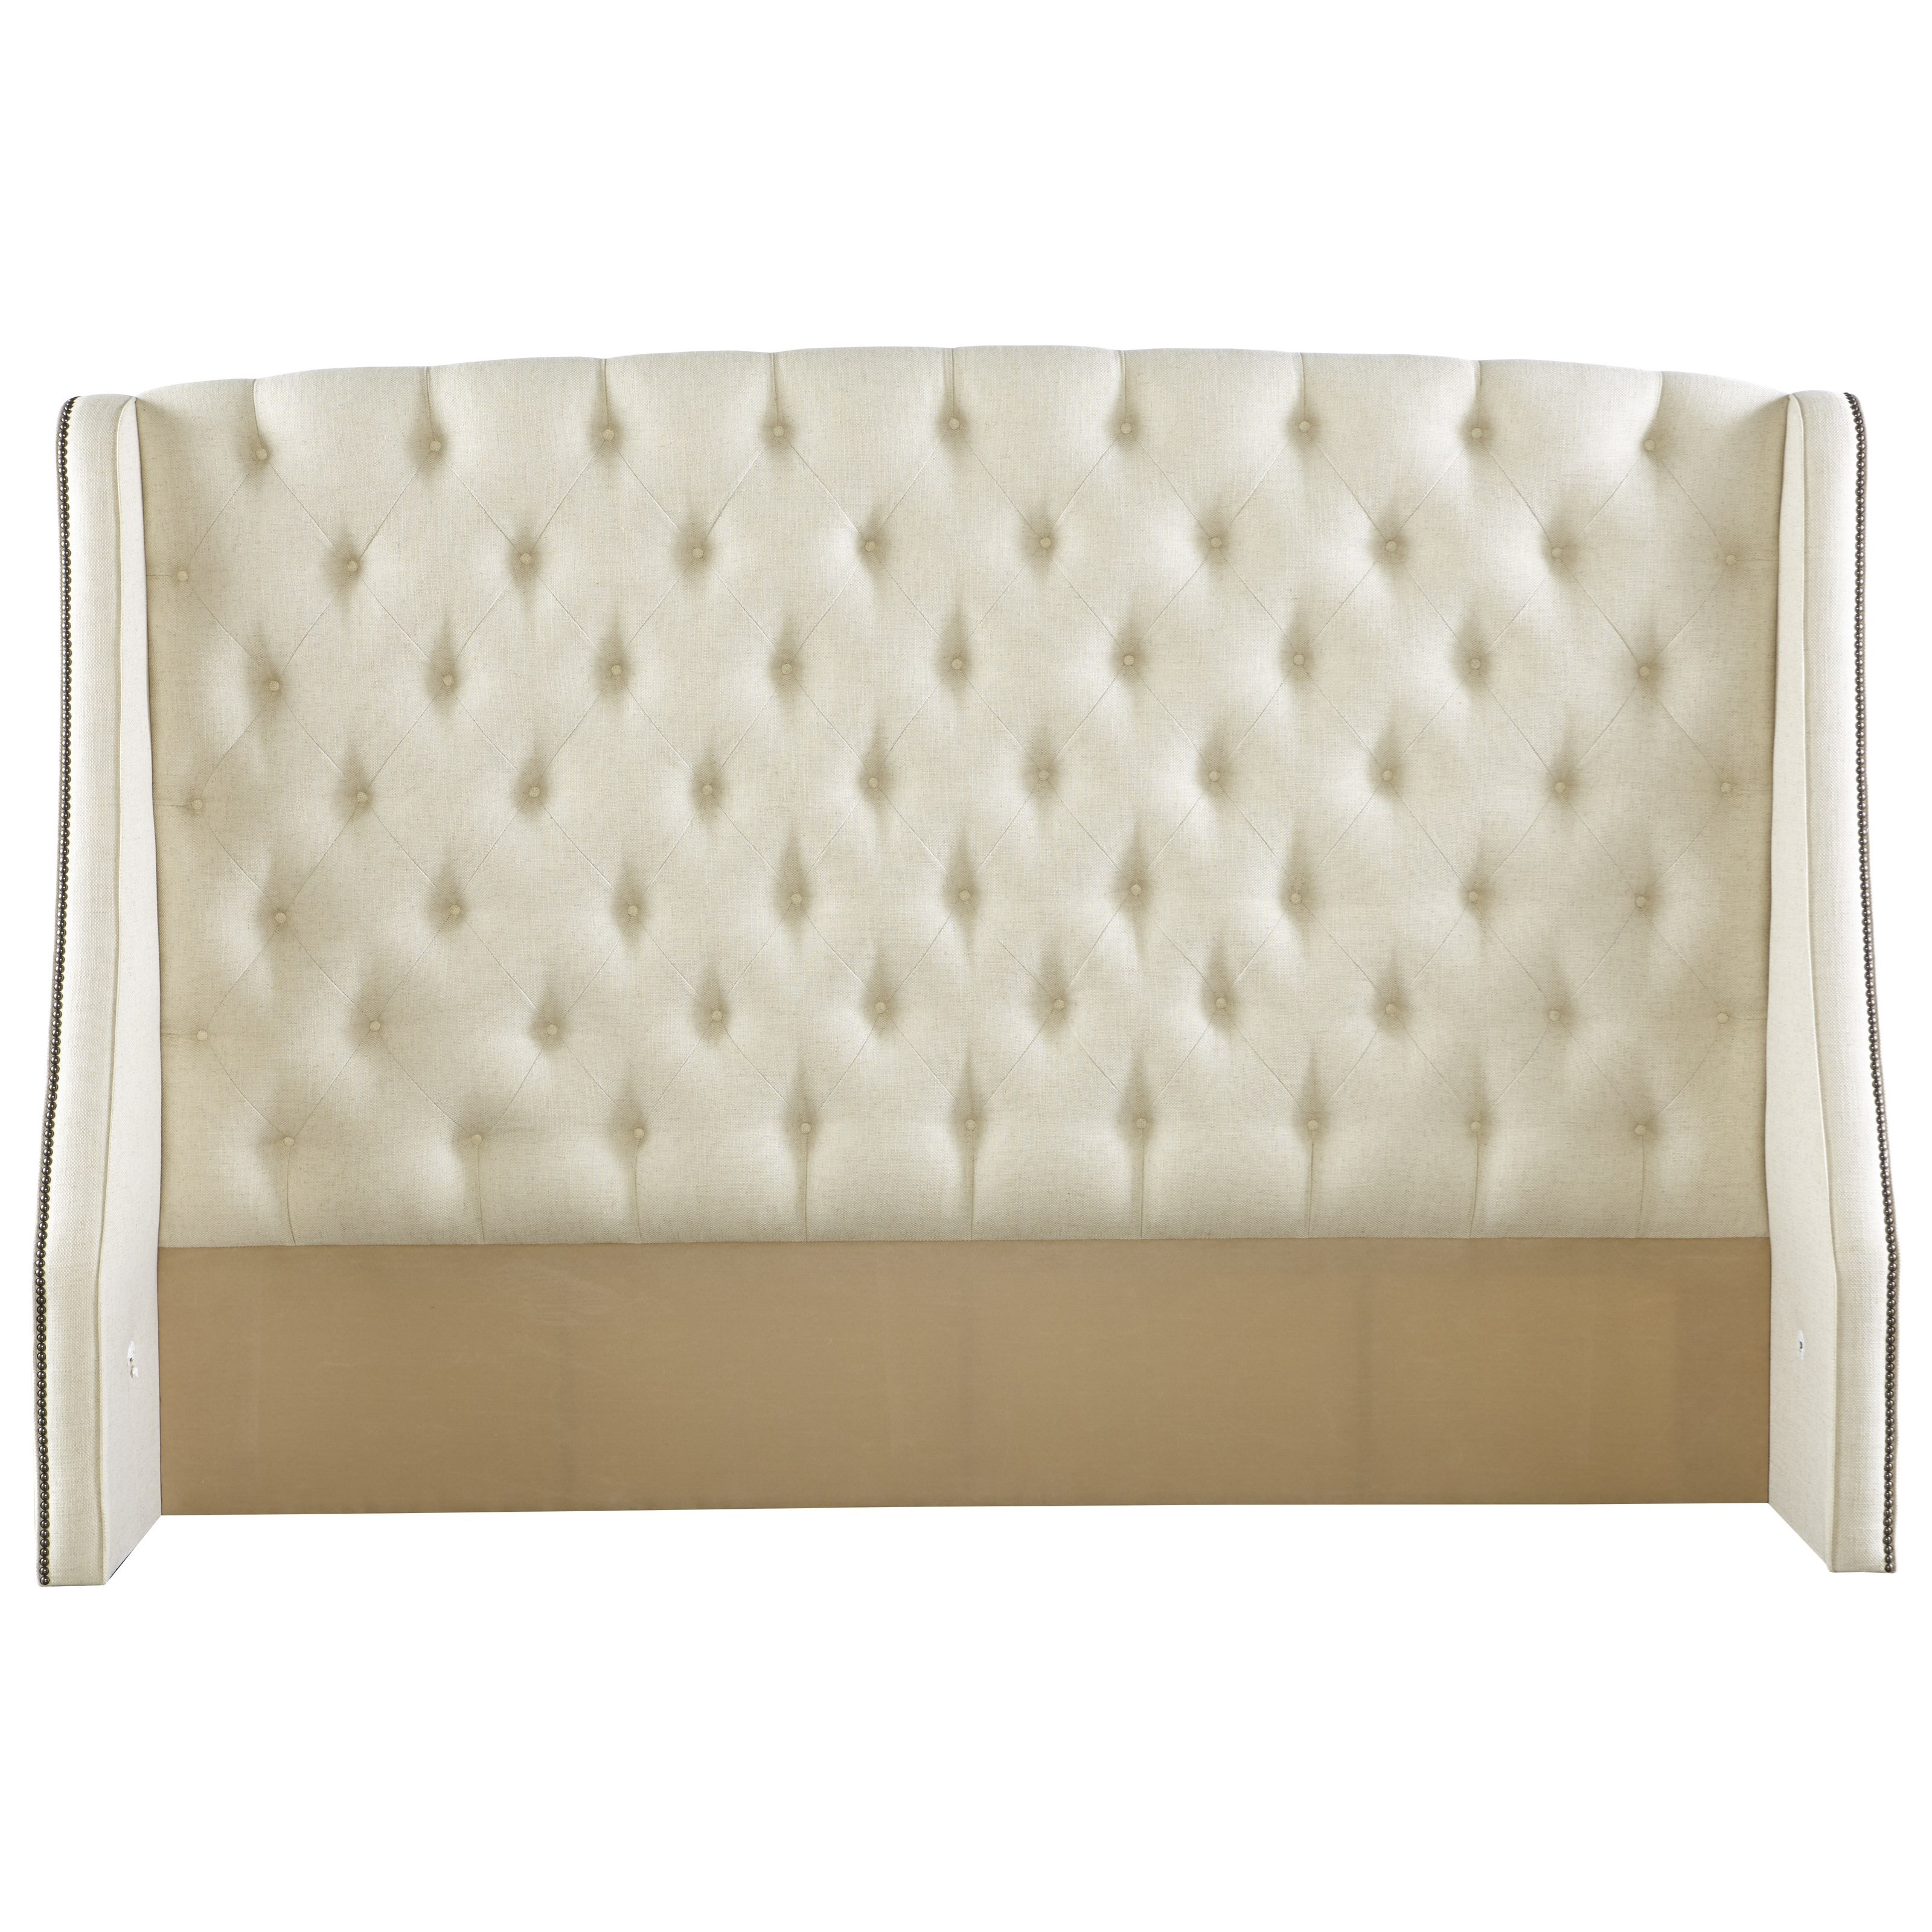 Rowe My Style Beds Kirkwood 54 King Headboard With Tufting Belfort Furniture Headboards